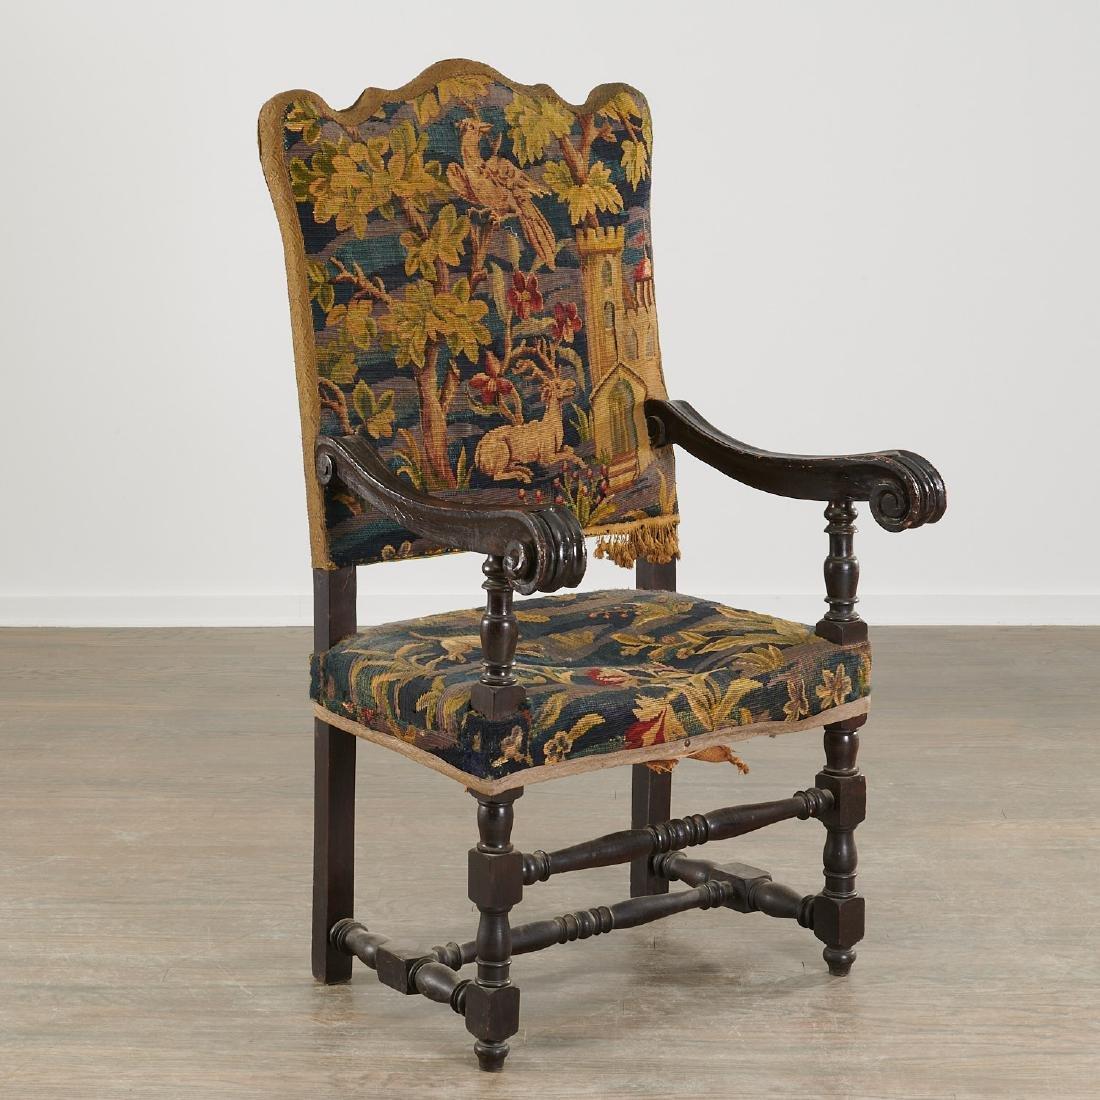 Flemish Baroque verdure tapestry armchair